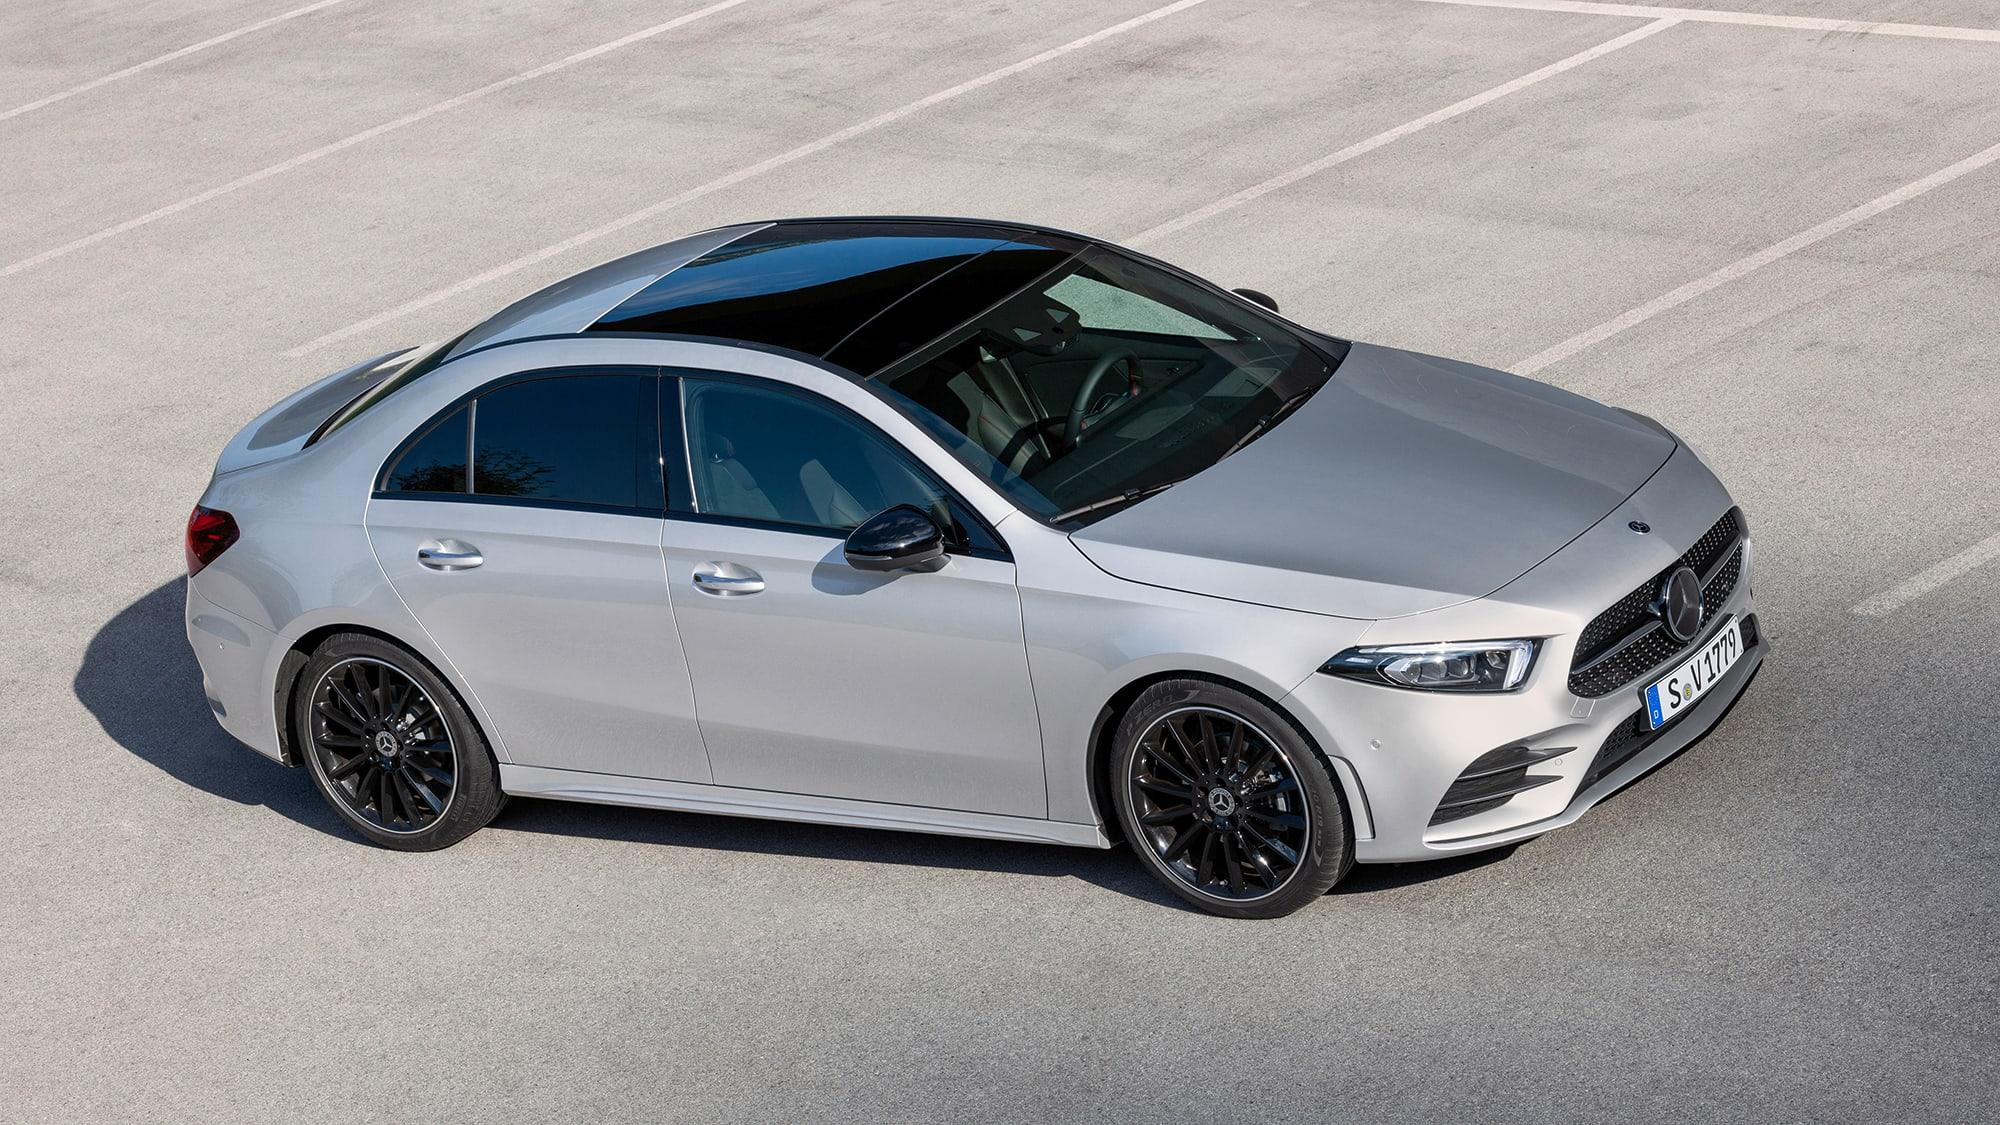 2019 Mercedes Benz A Class Sedan Pricing And Specs Caradvice